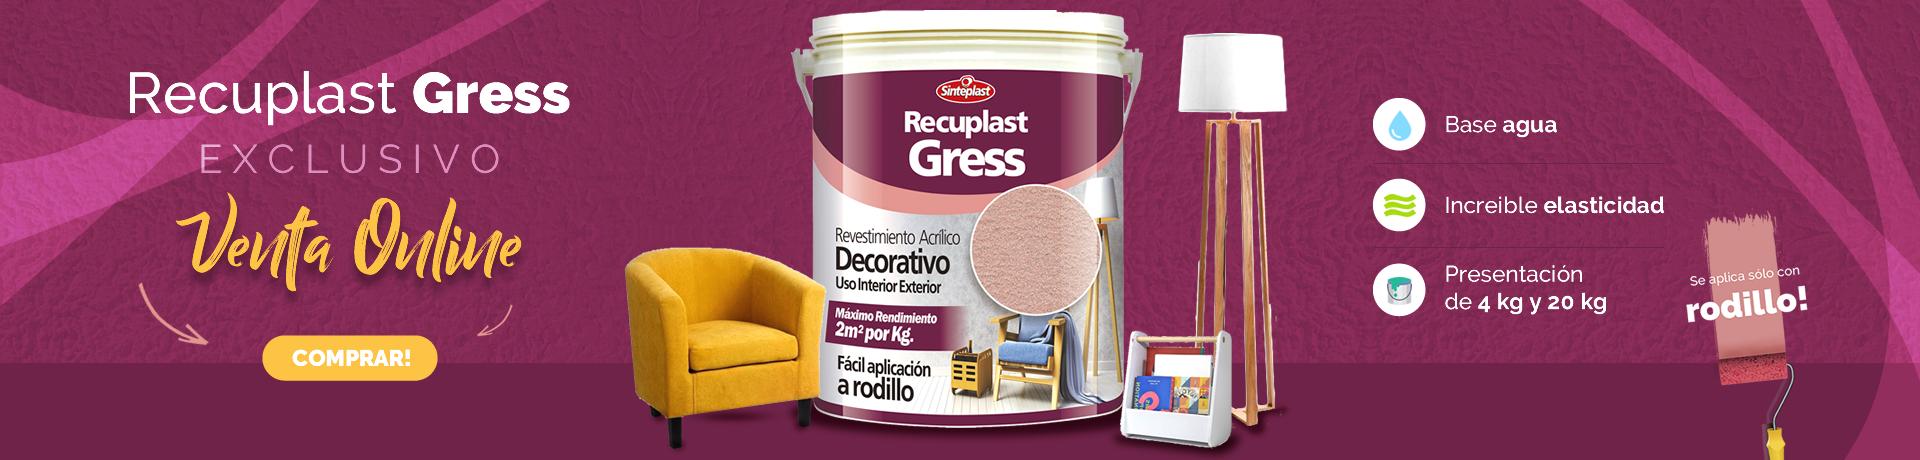 Recuplast Gress